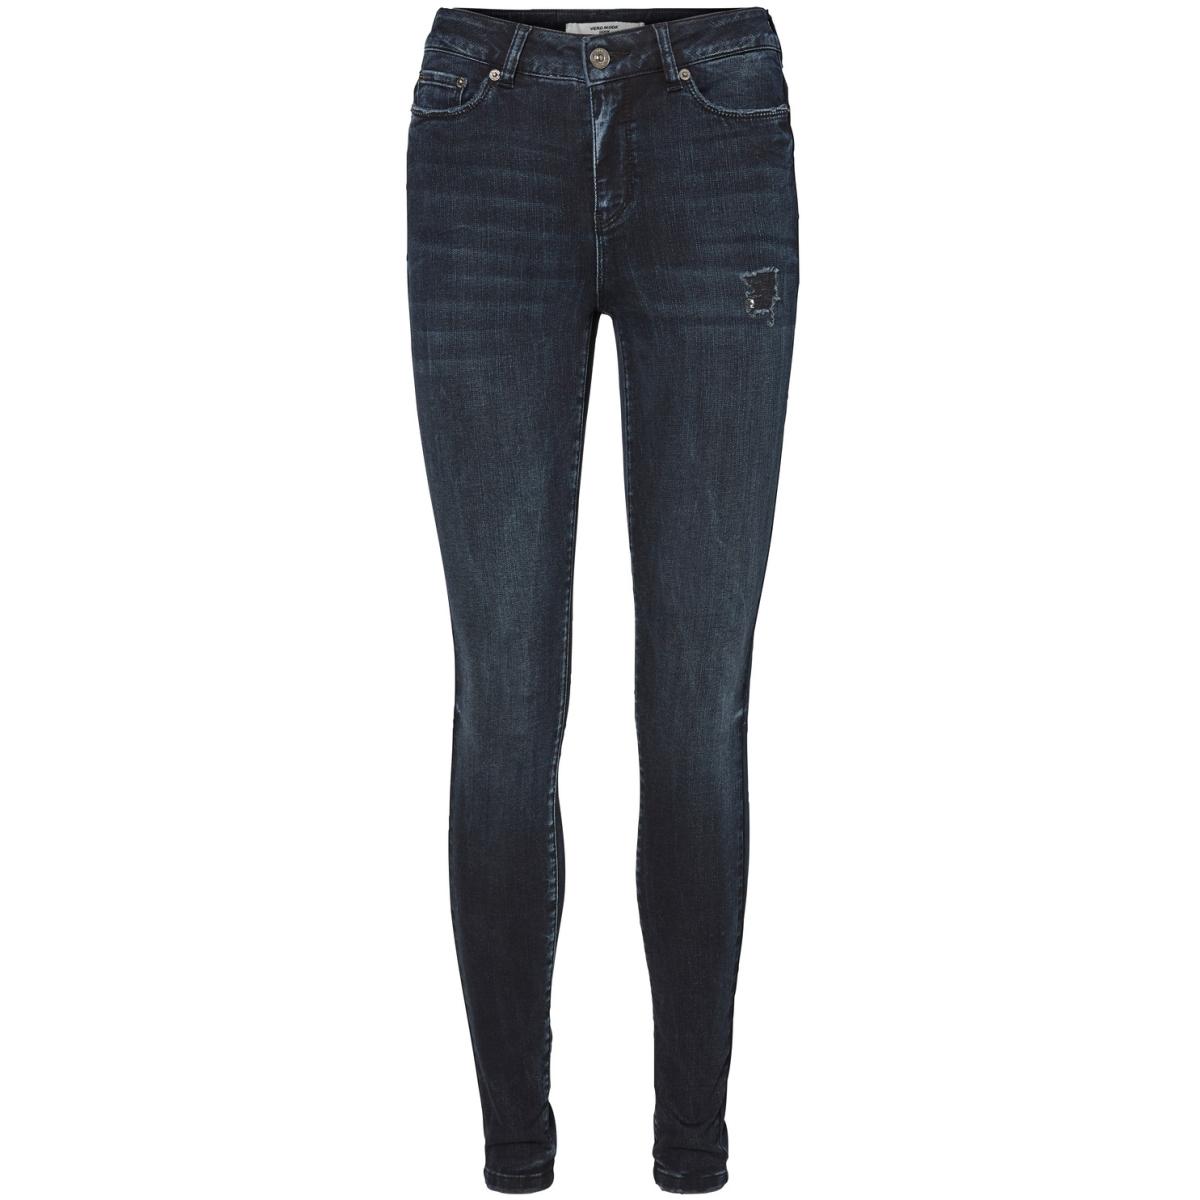 vmseven nw ss blackblue jeans 10187372 vero moda jeans dark blue denim